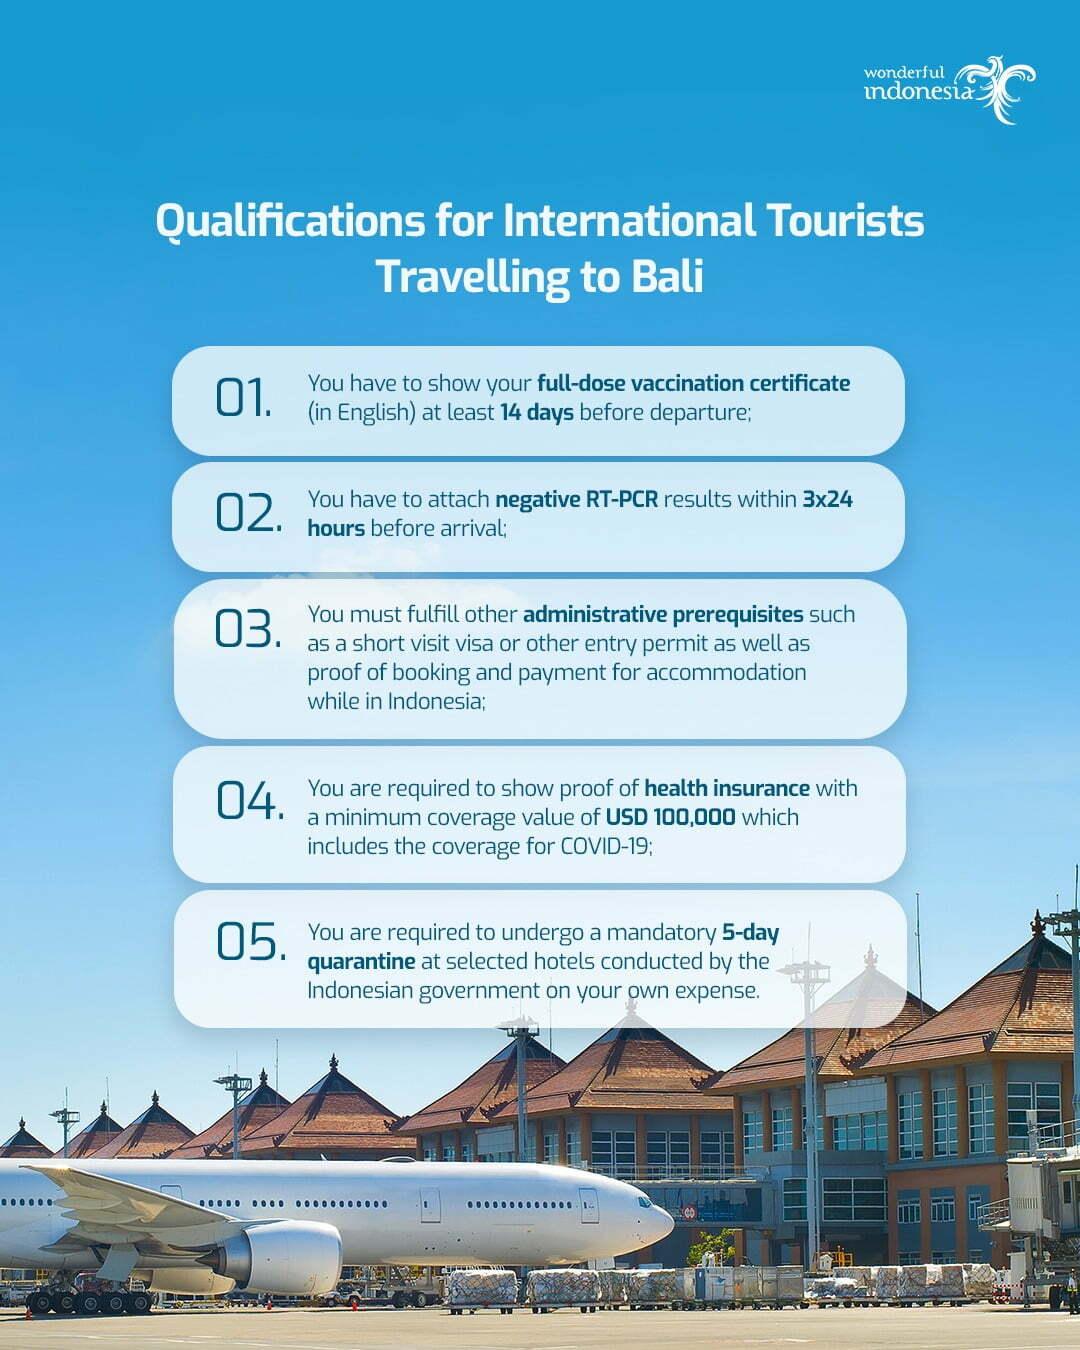 coronavirus regulation qualifications for international tourists travelling to Bali